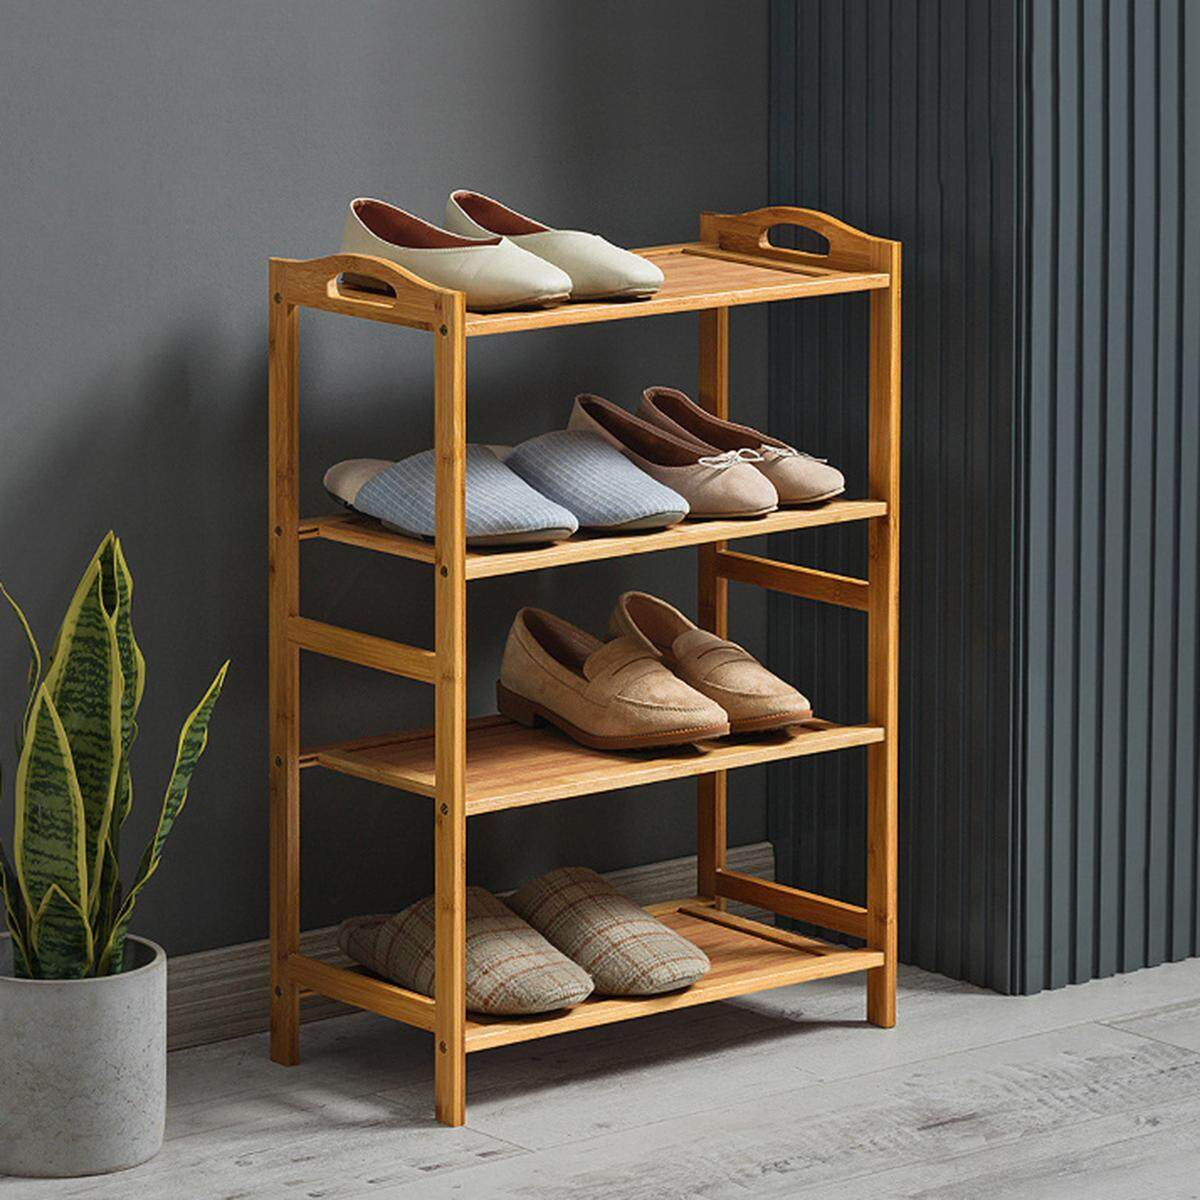 Mu Ma Ren 4 Tiers 70cm Length Bamboo Shelf Bookcase Plant Flower Shoes Stand Rack Storage Shelves Organiser Renting/Decoration